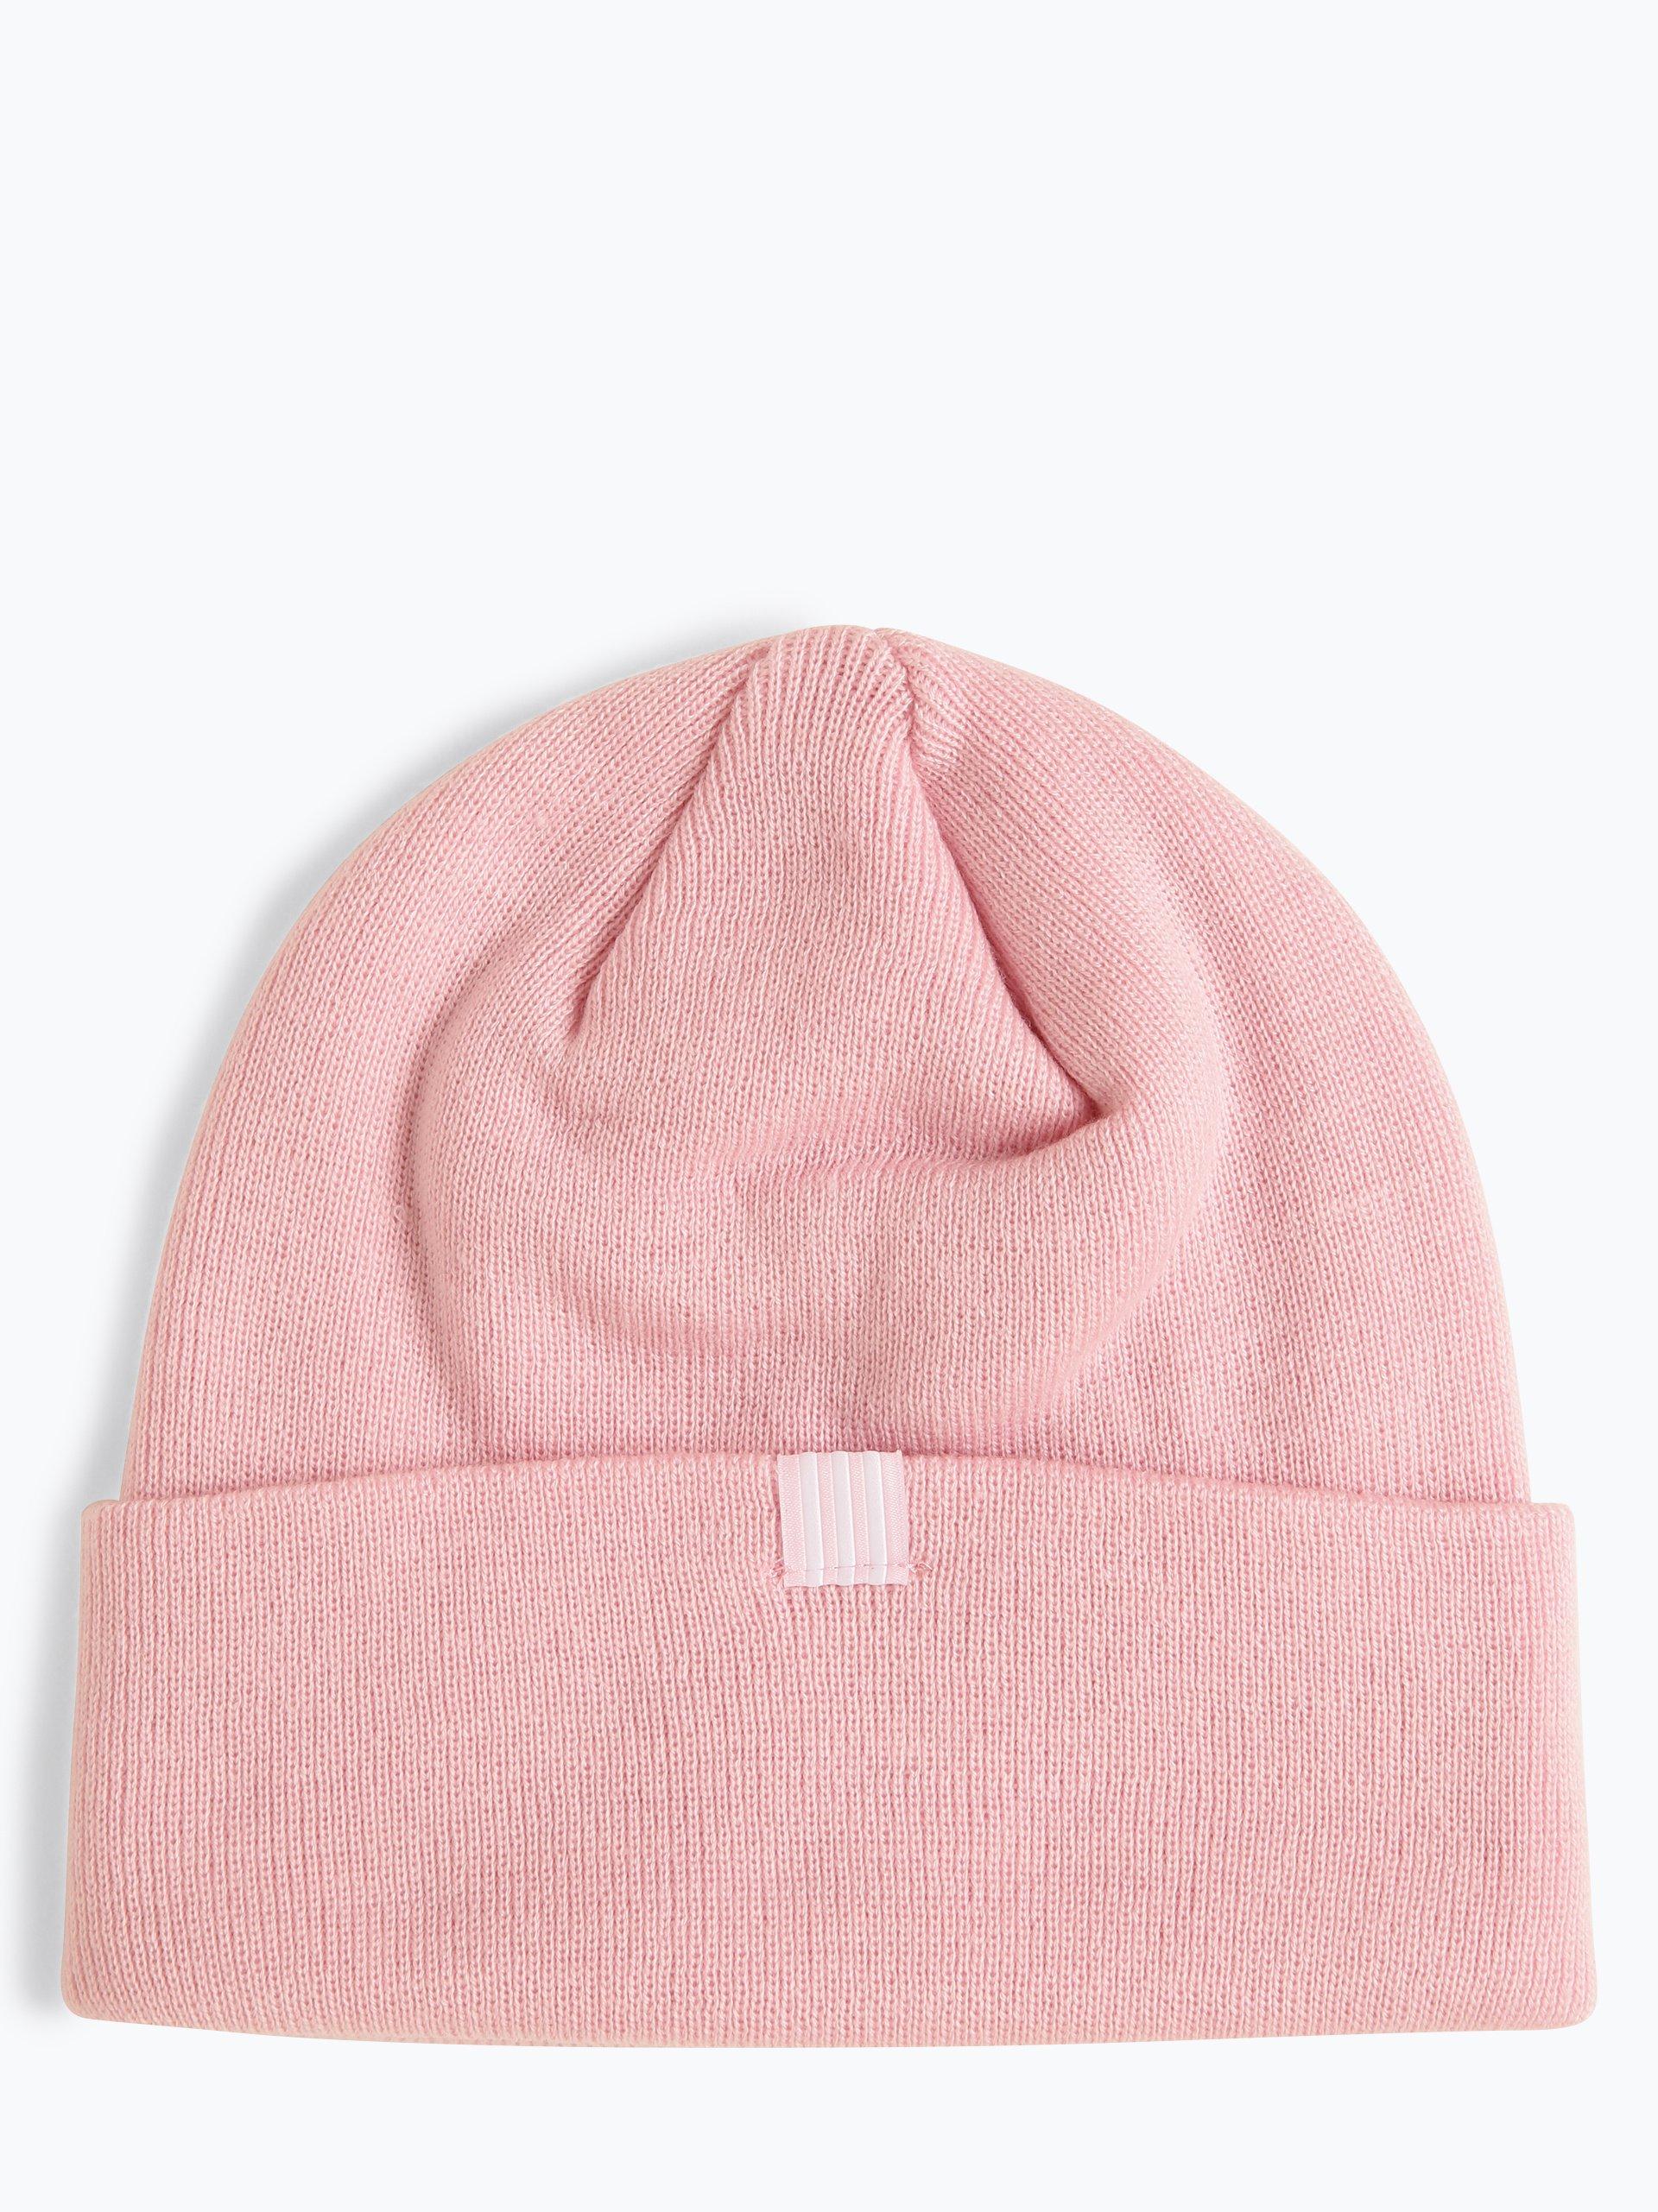 adidas Originals Damen Mütze